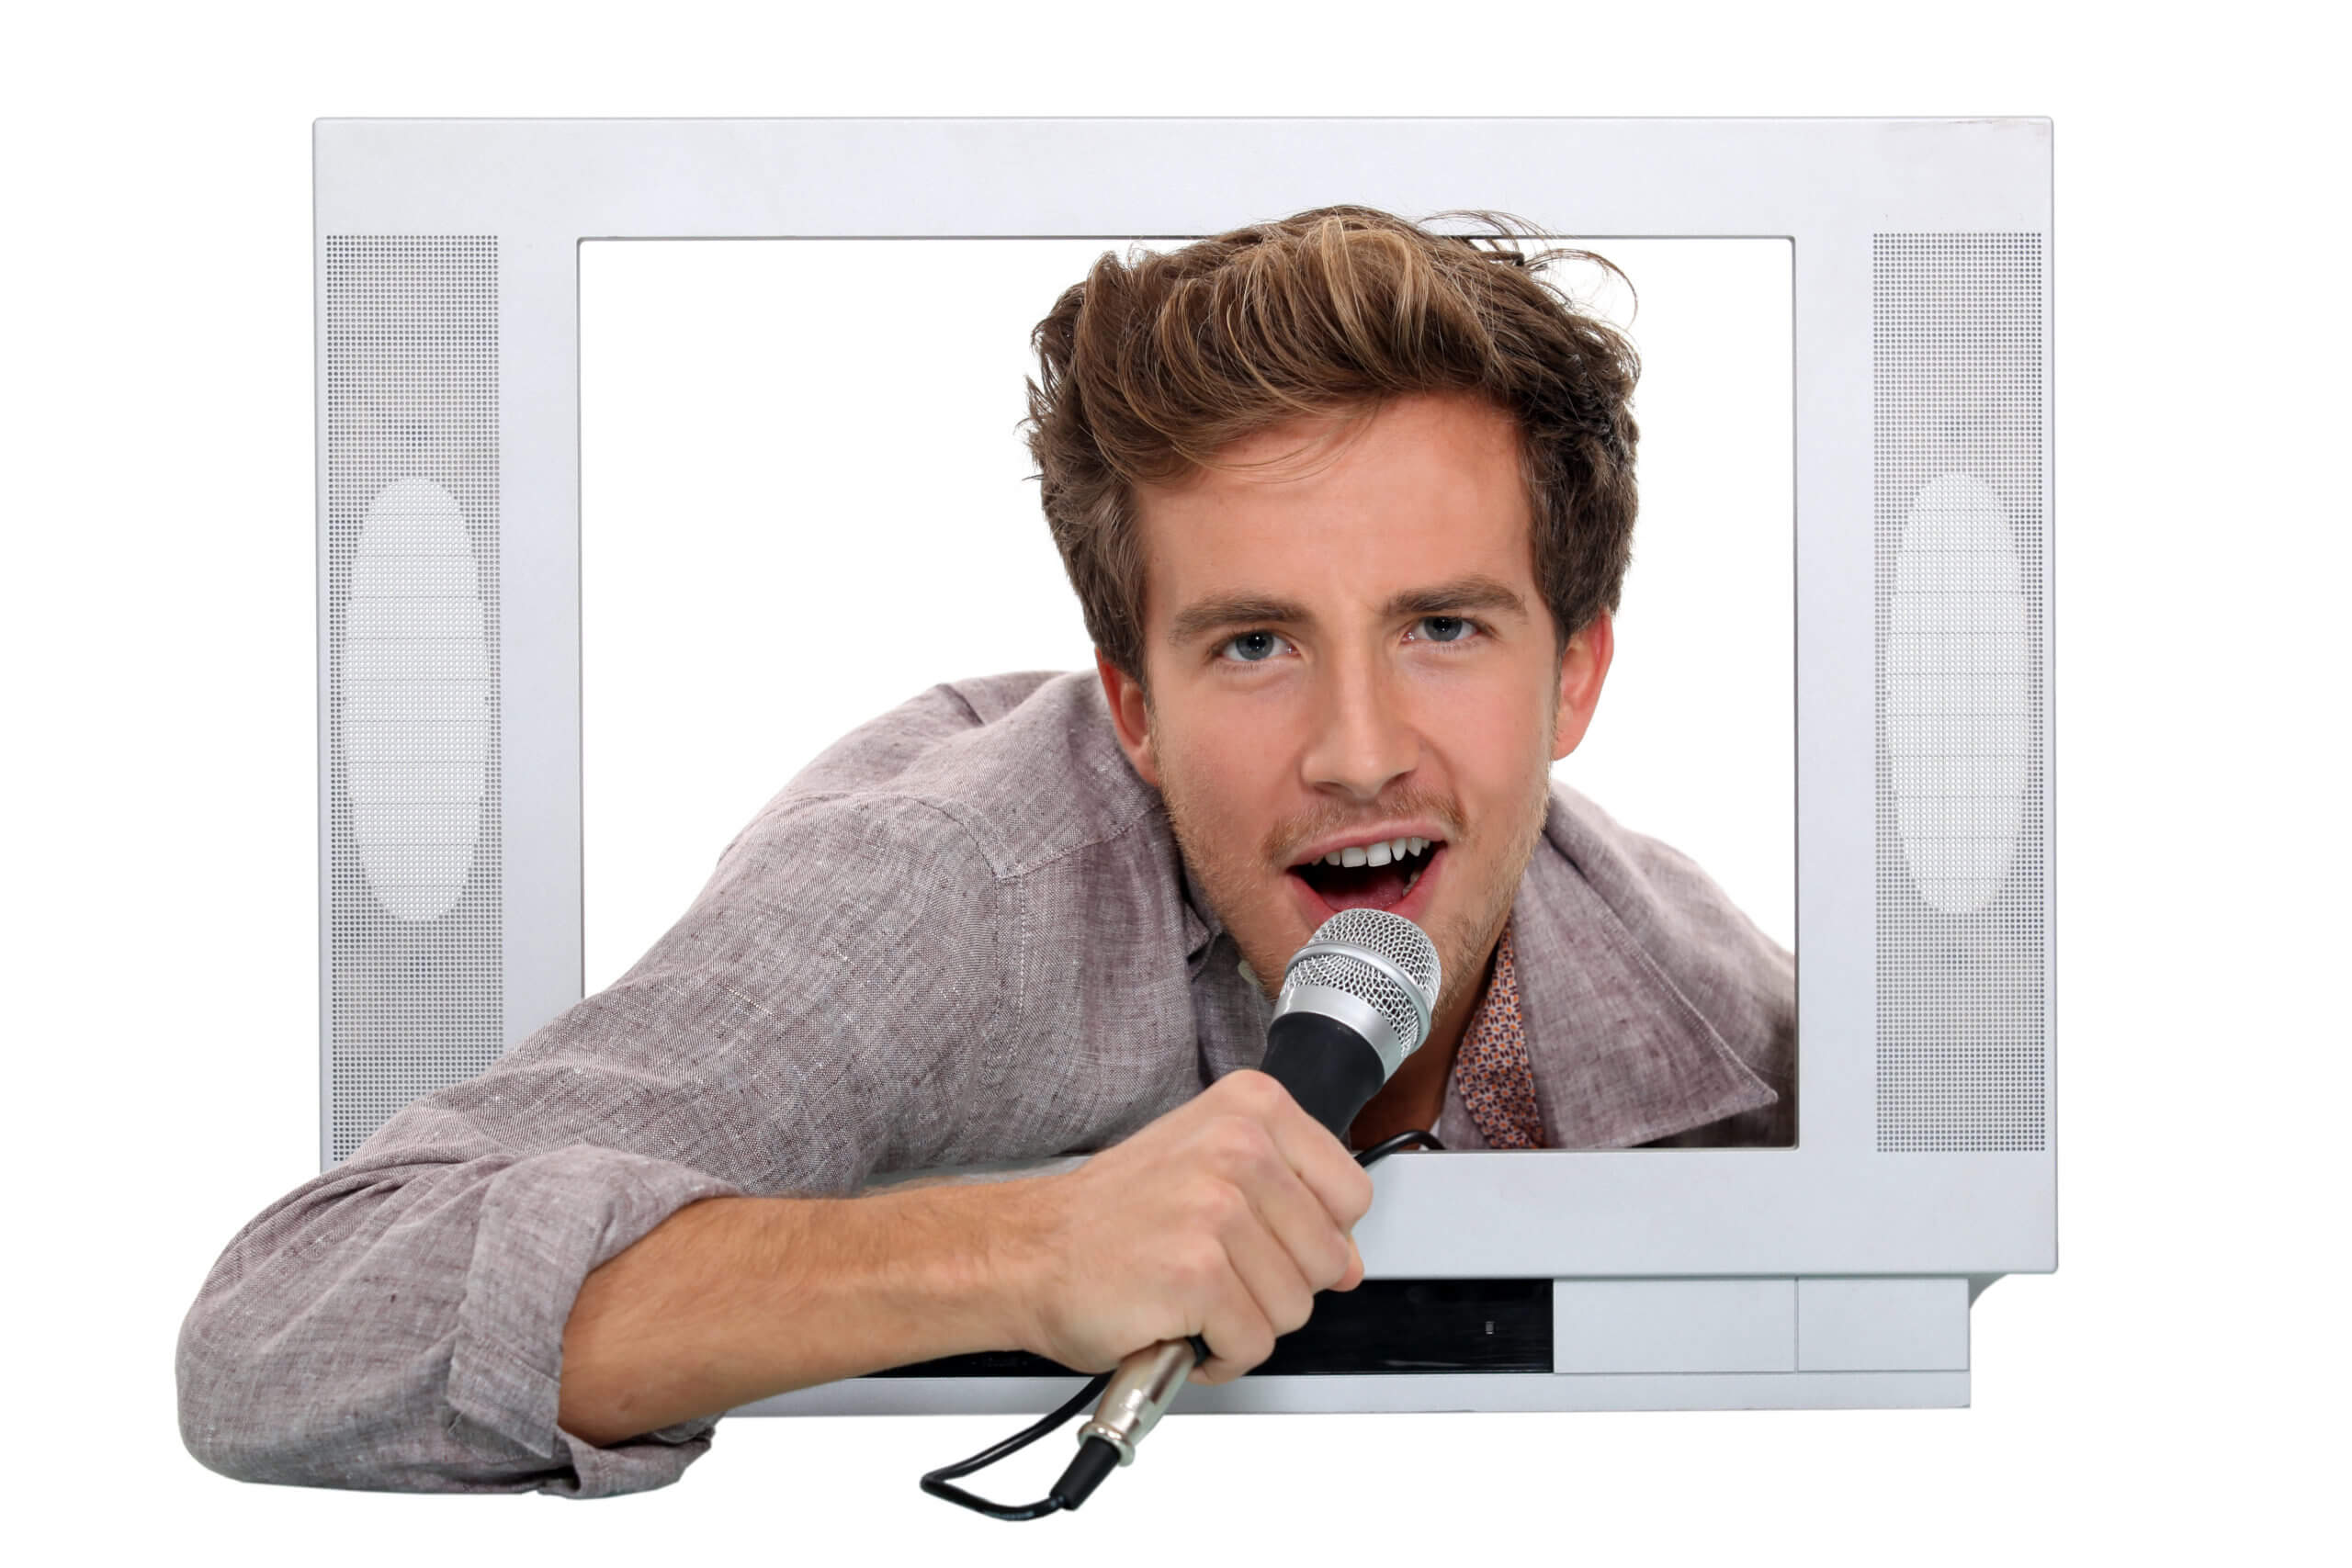 Man singing inside television